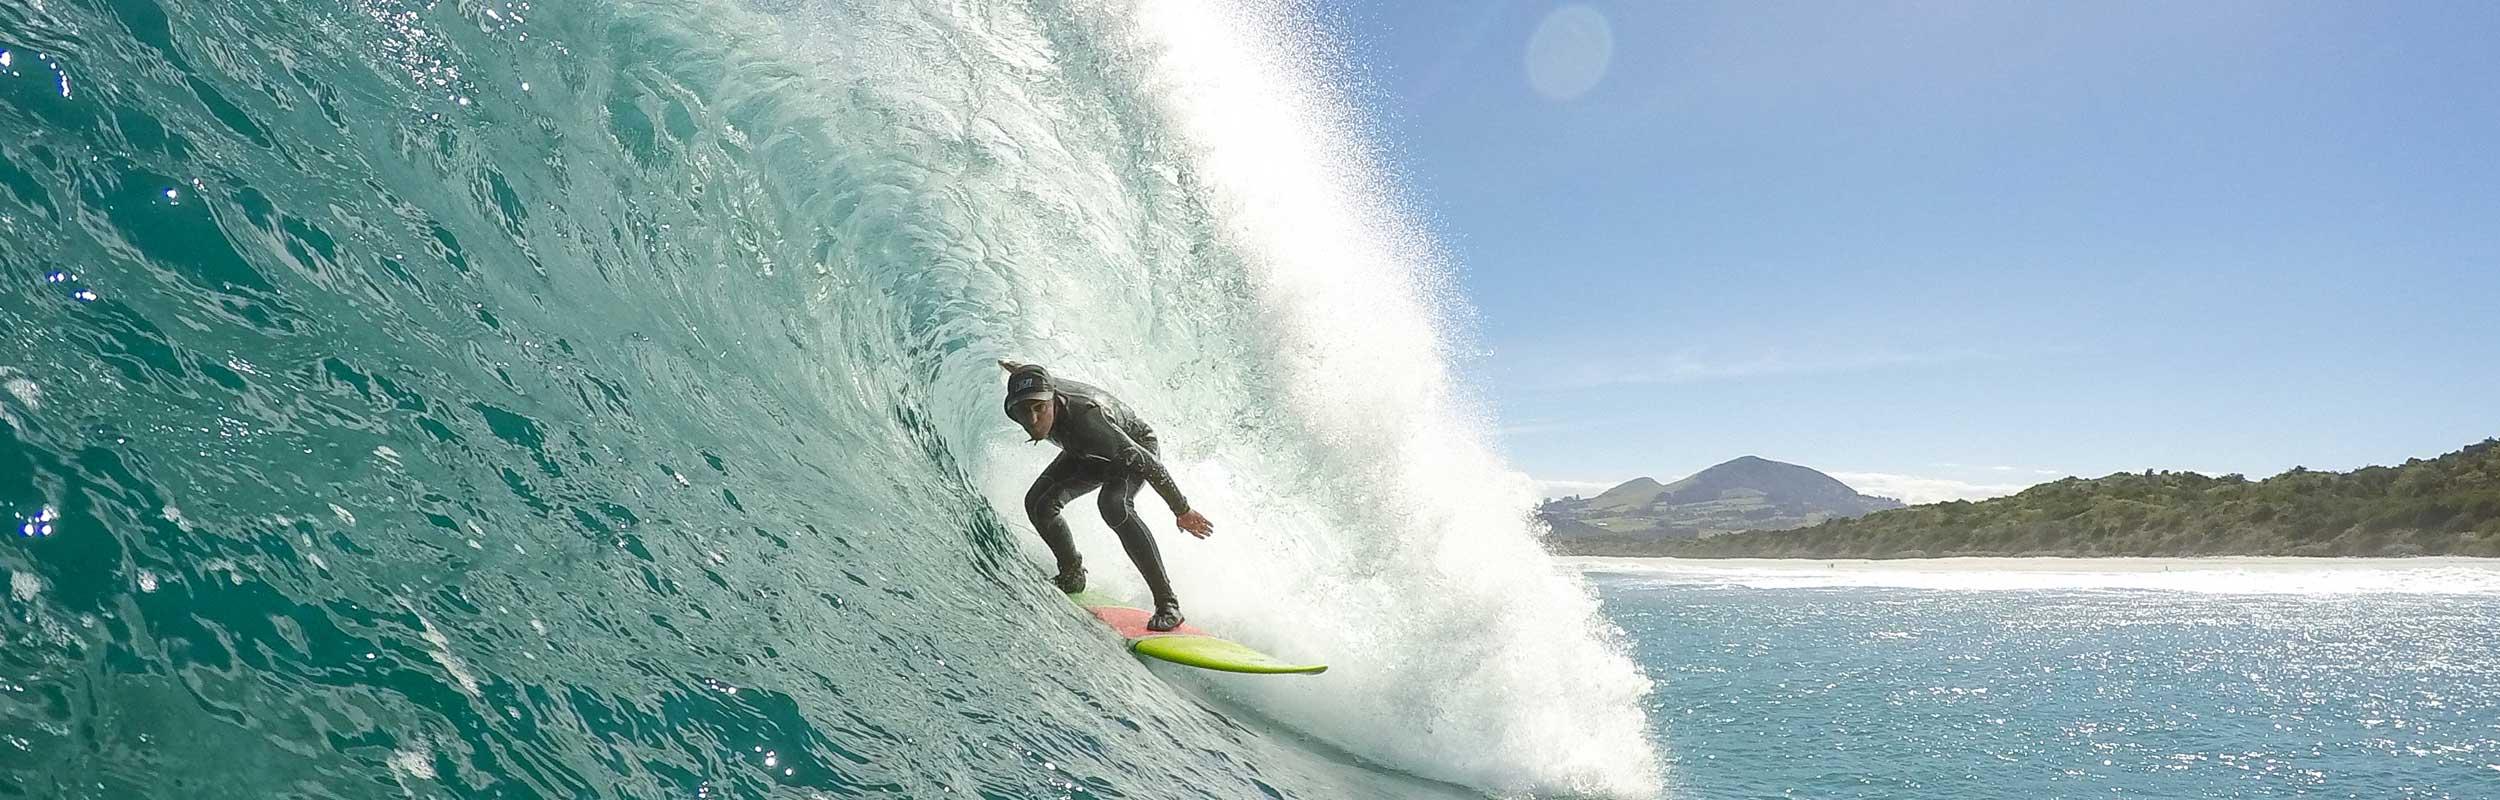 Dunedin Surfer at Blackhead